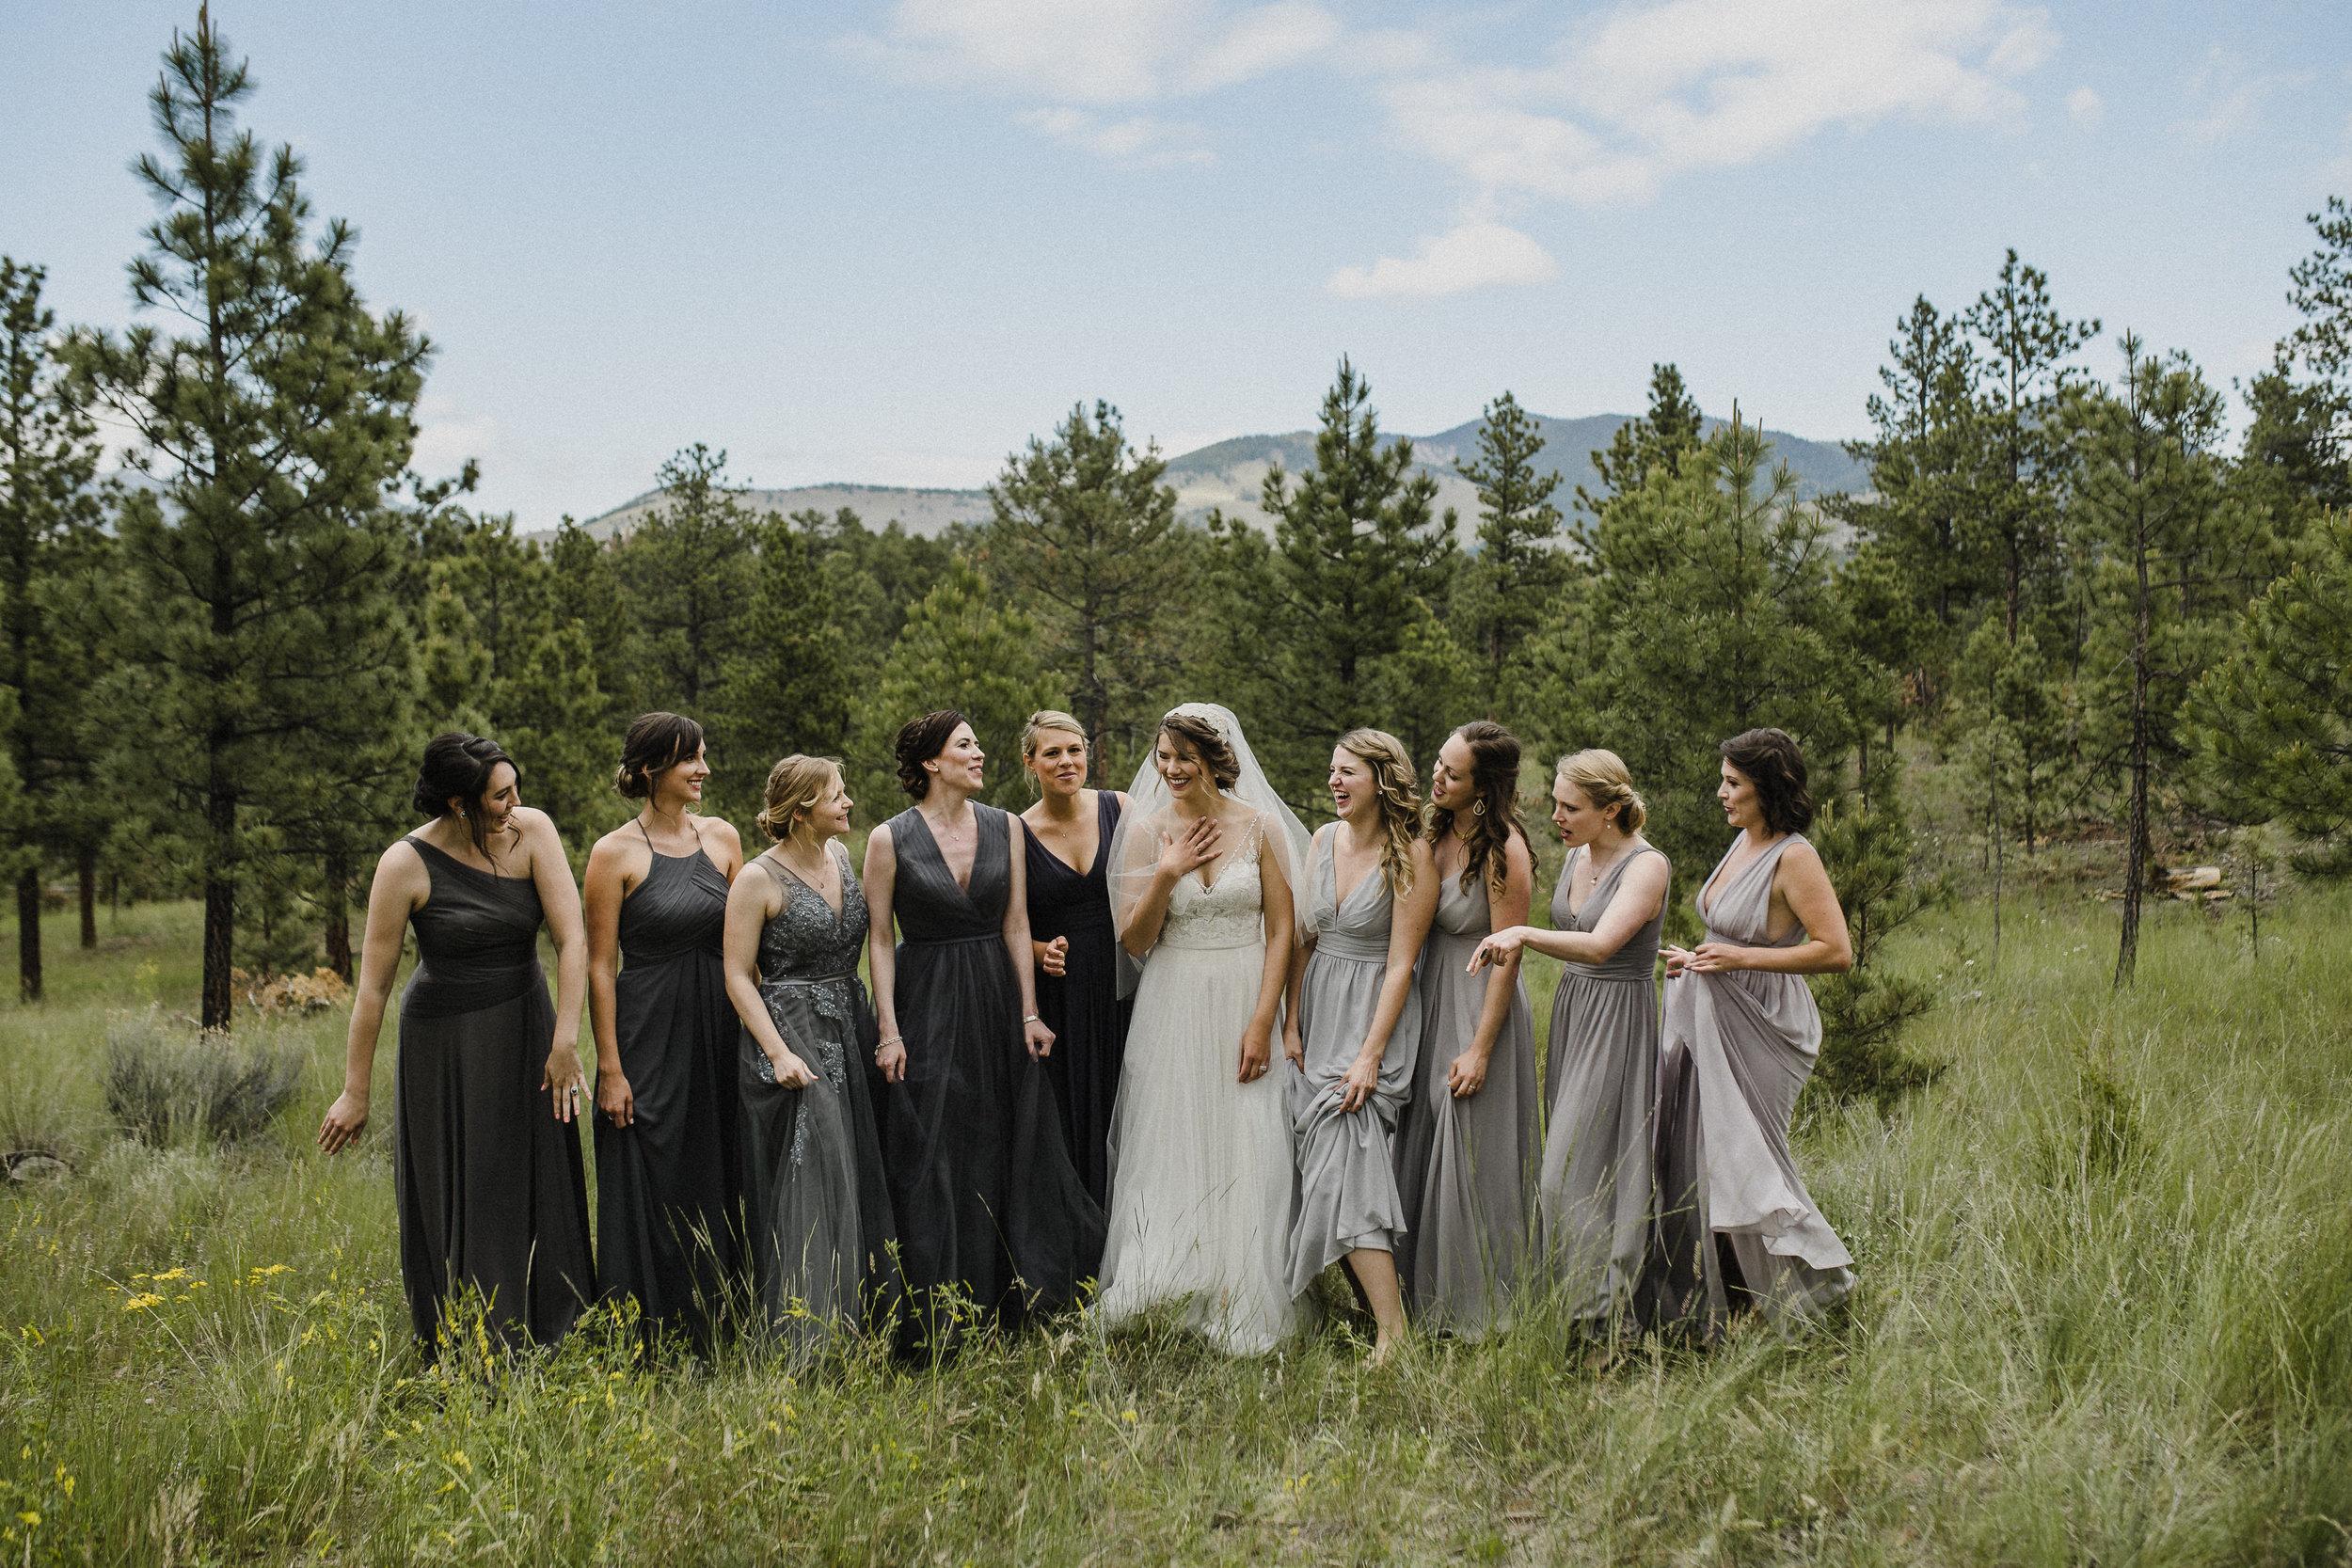 Wedding in Helena at Summer Star Ranch